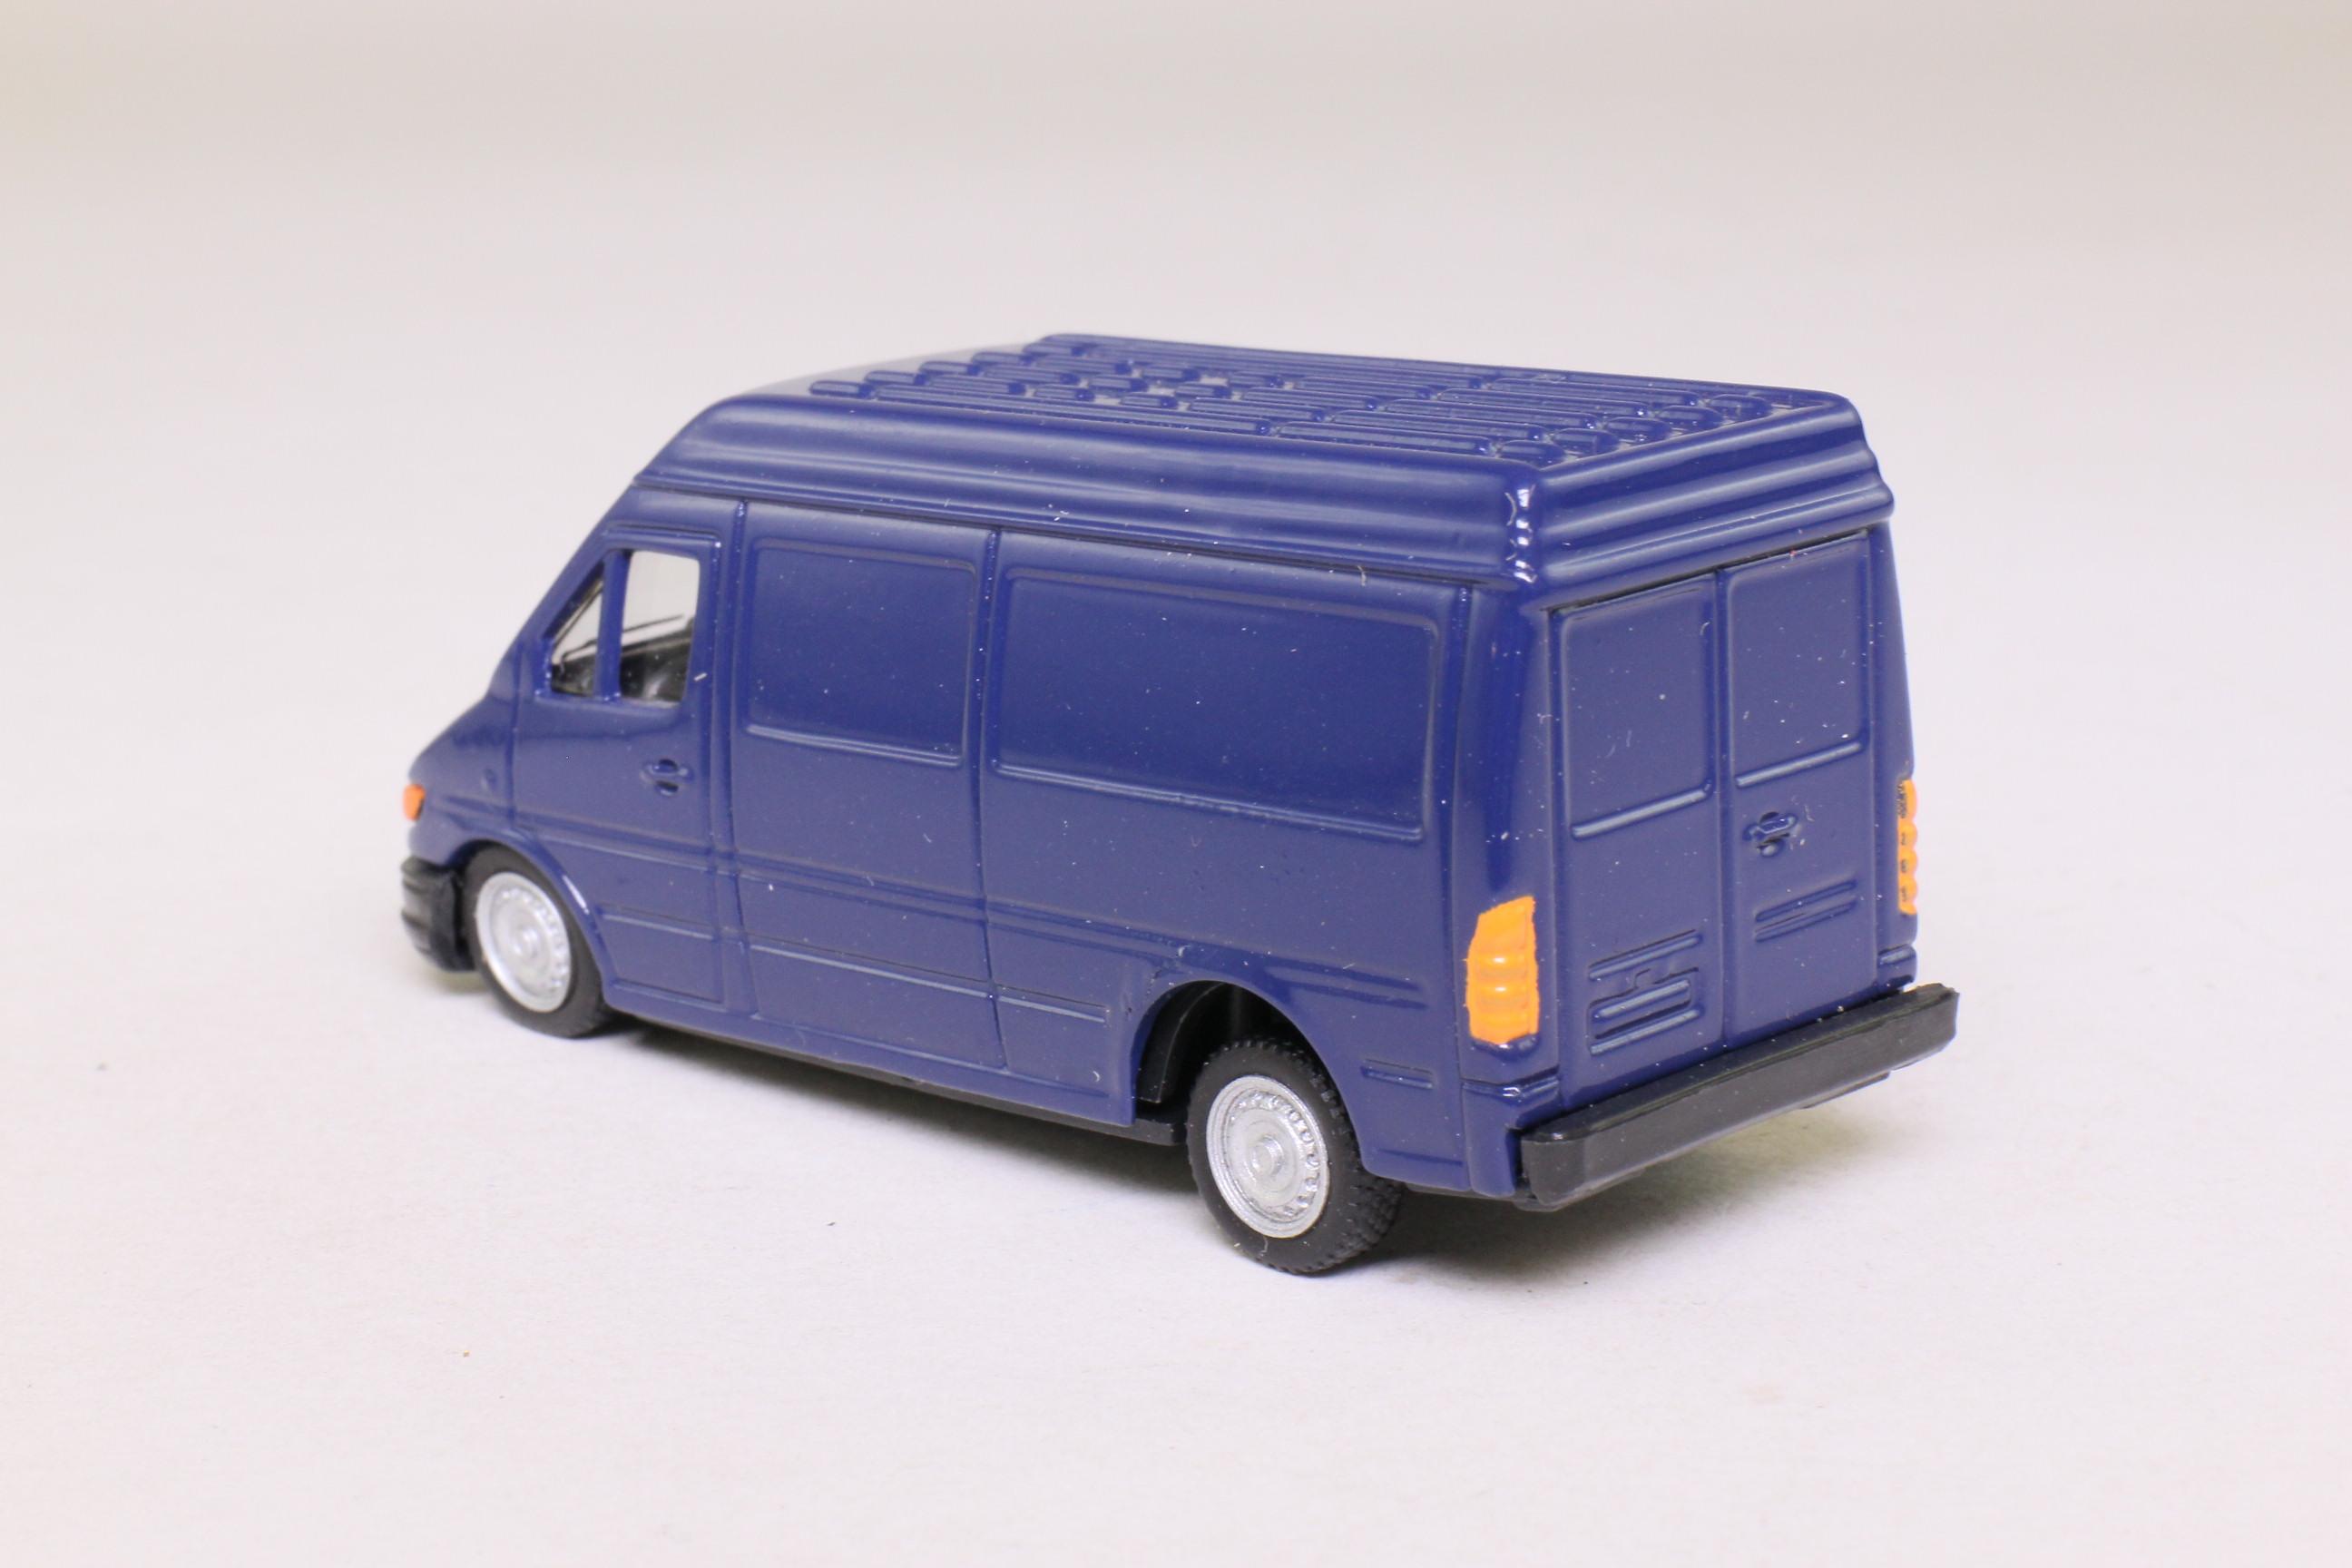 cararama 1 72 scale ford transit van blue excellent. Black Bedroom Furniture Sets. Home Design Ideas